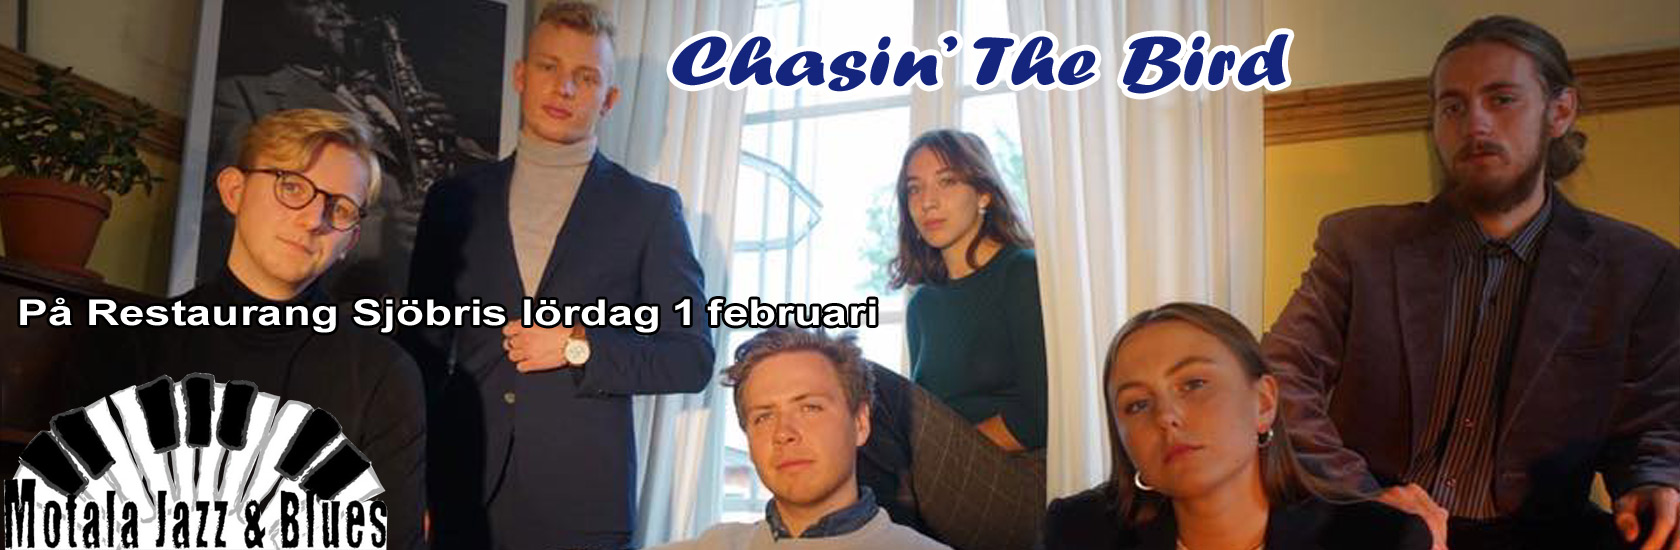 chasin_the_bird